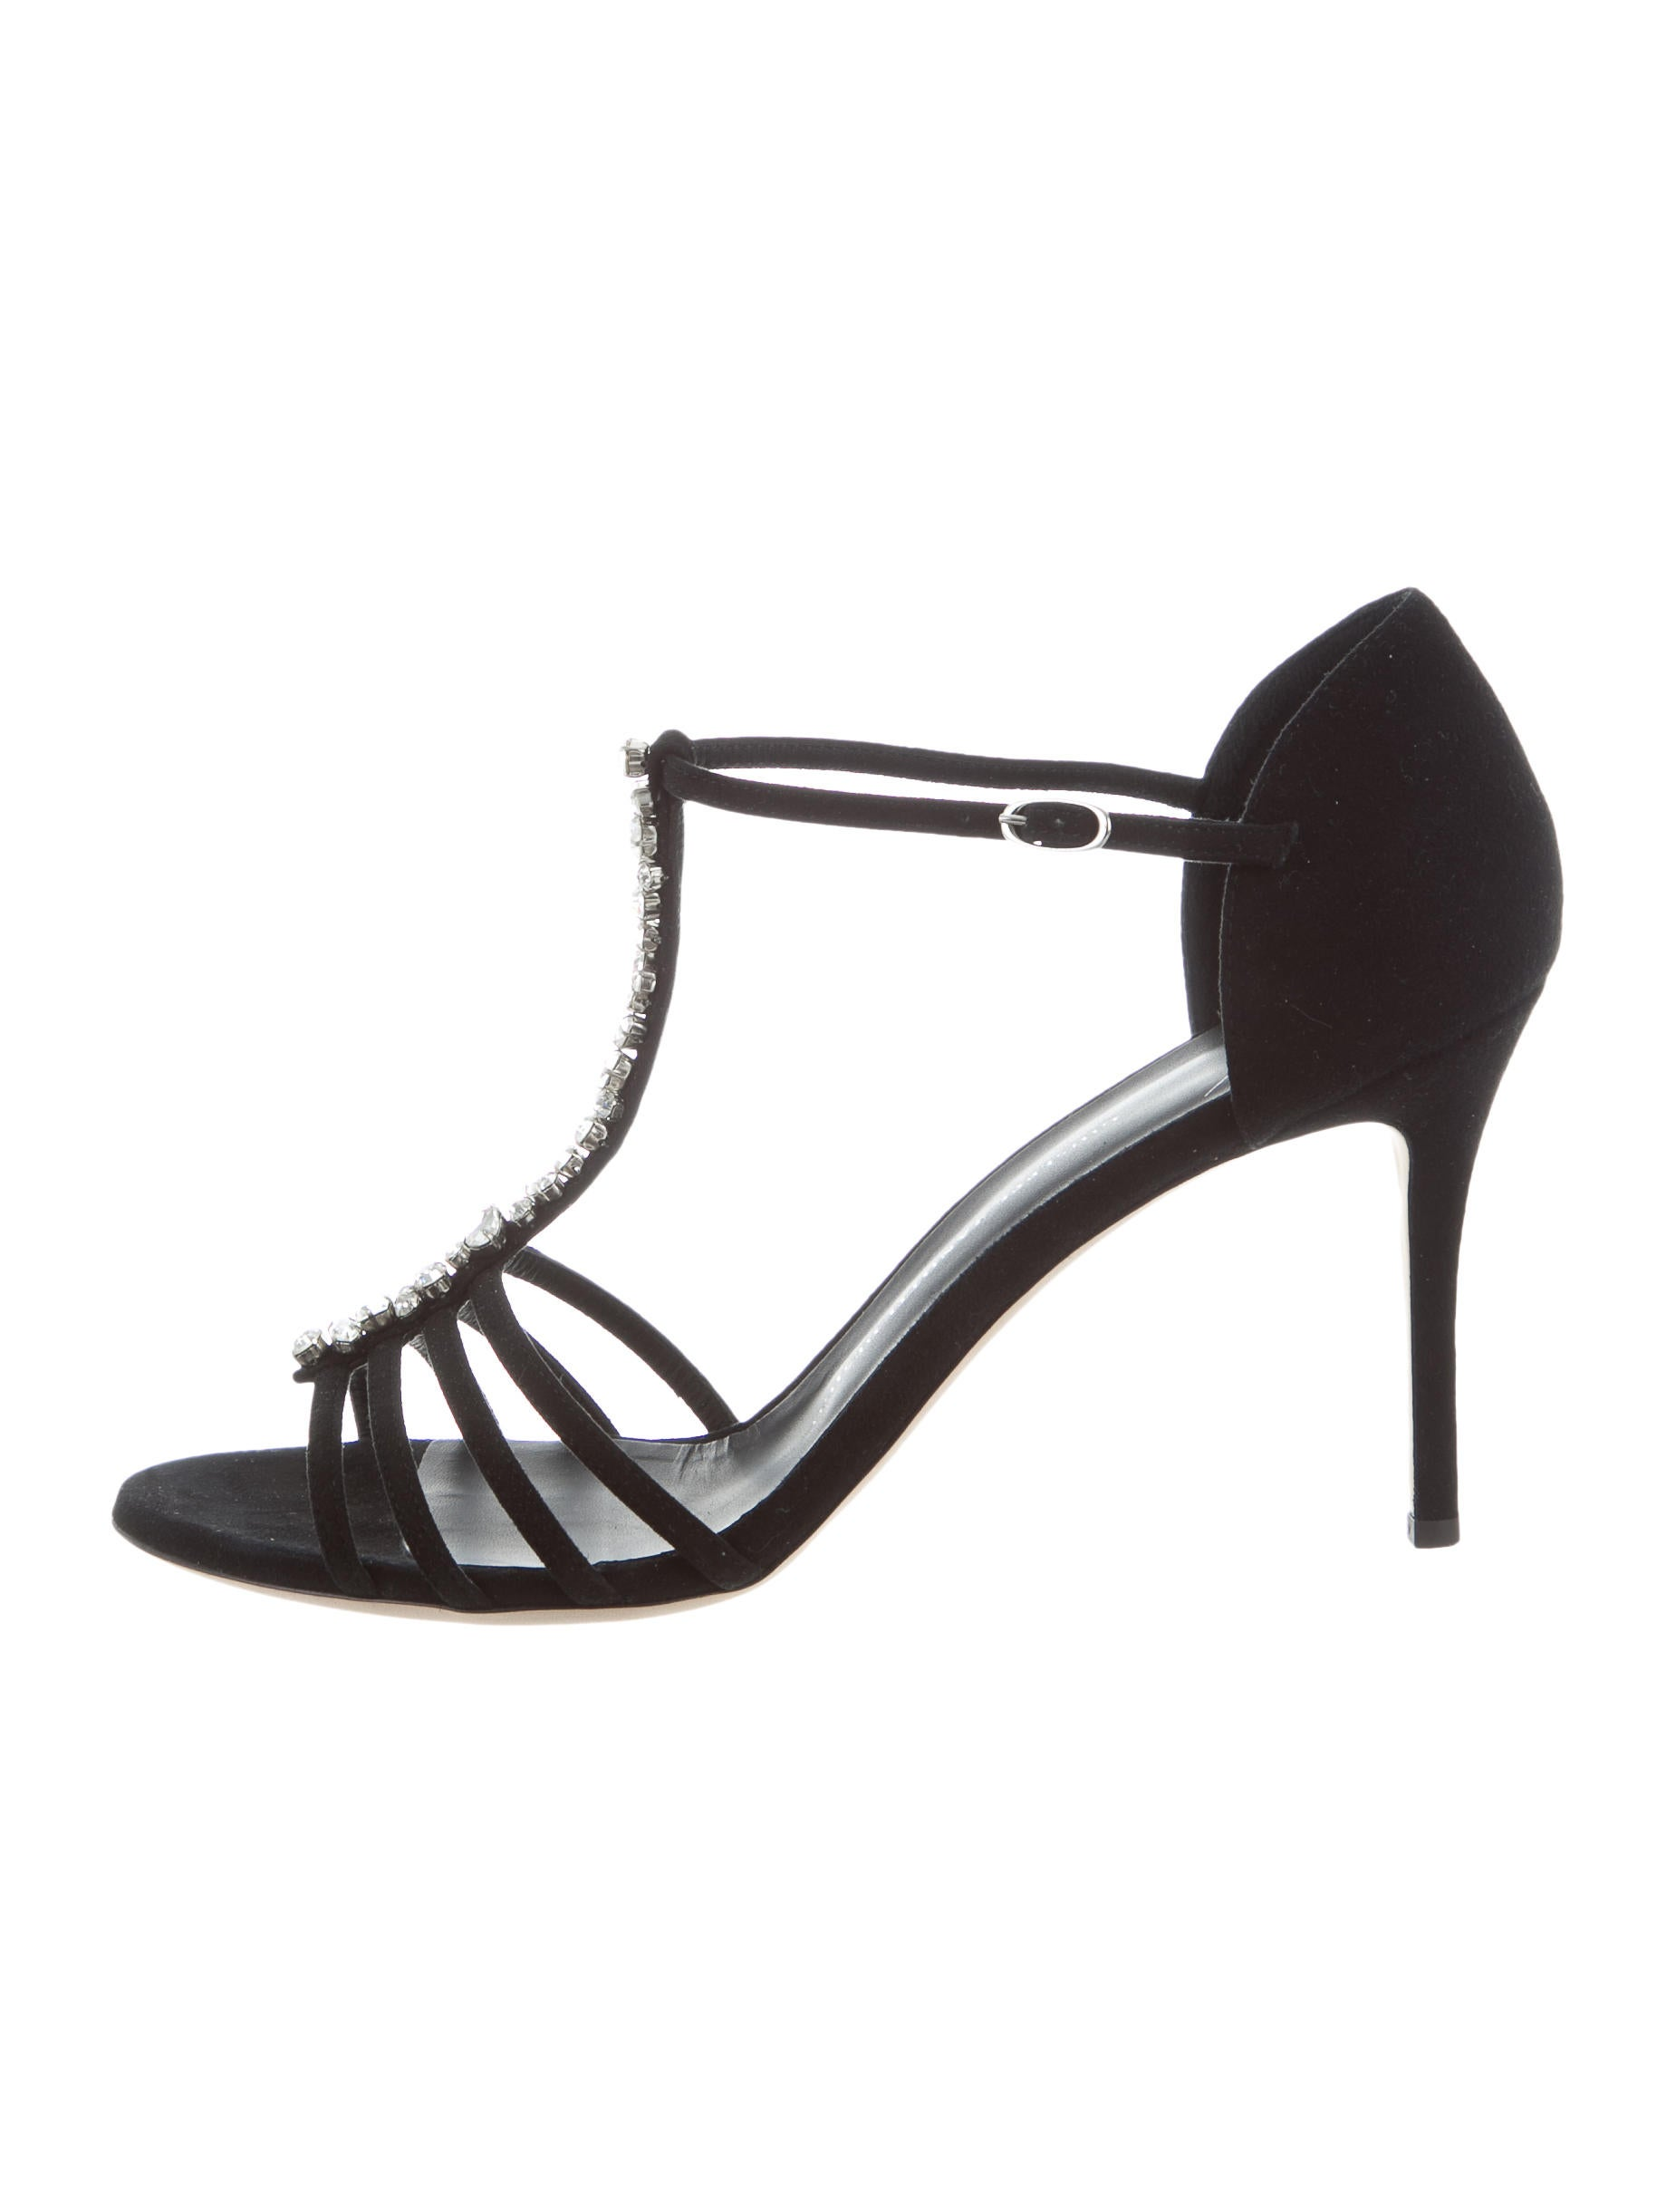 1390255641 Giuseppe Zanotti Embellished T-Strap Sandals - Shoes - GIU38988 ...